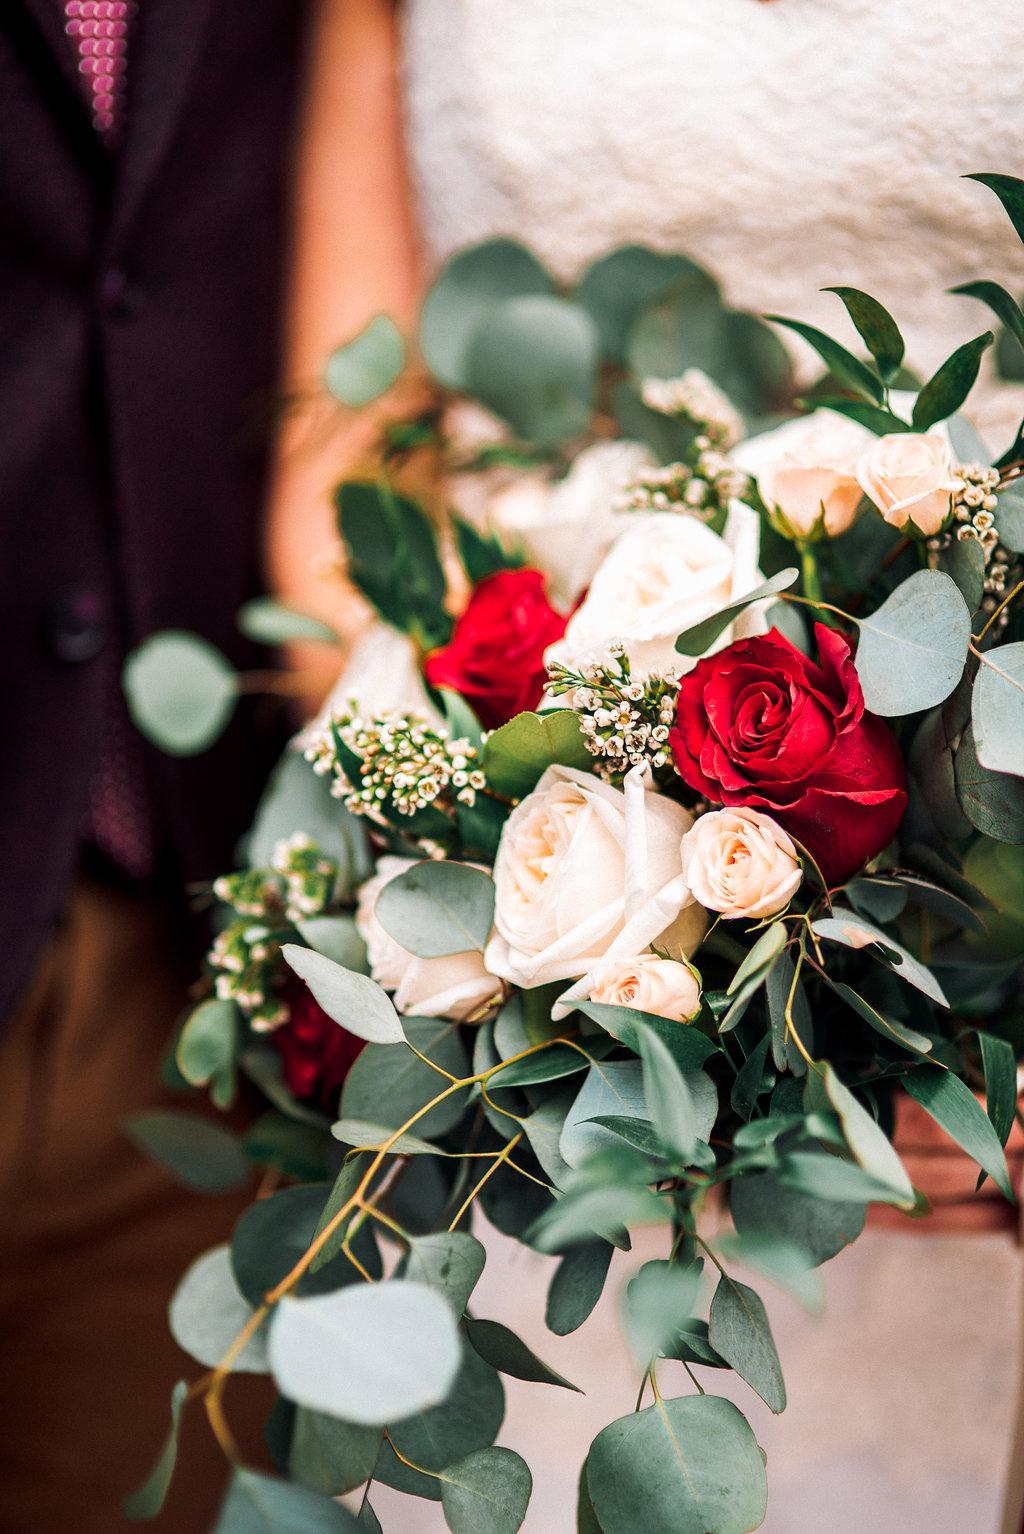 Boho Wedding Inspiration - Burgundy and Gold Wedding - Ontario, Canada Wedding Photographer